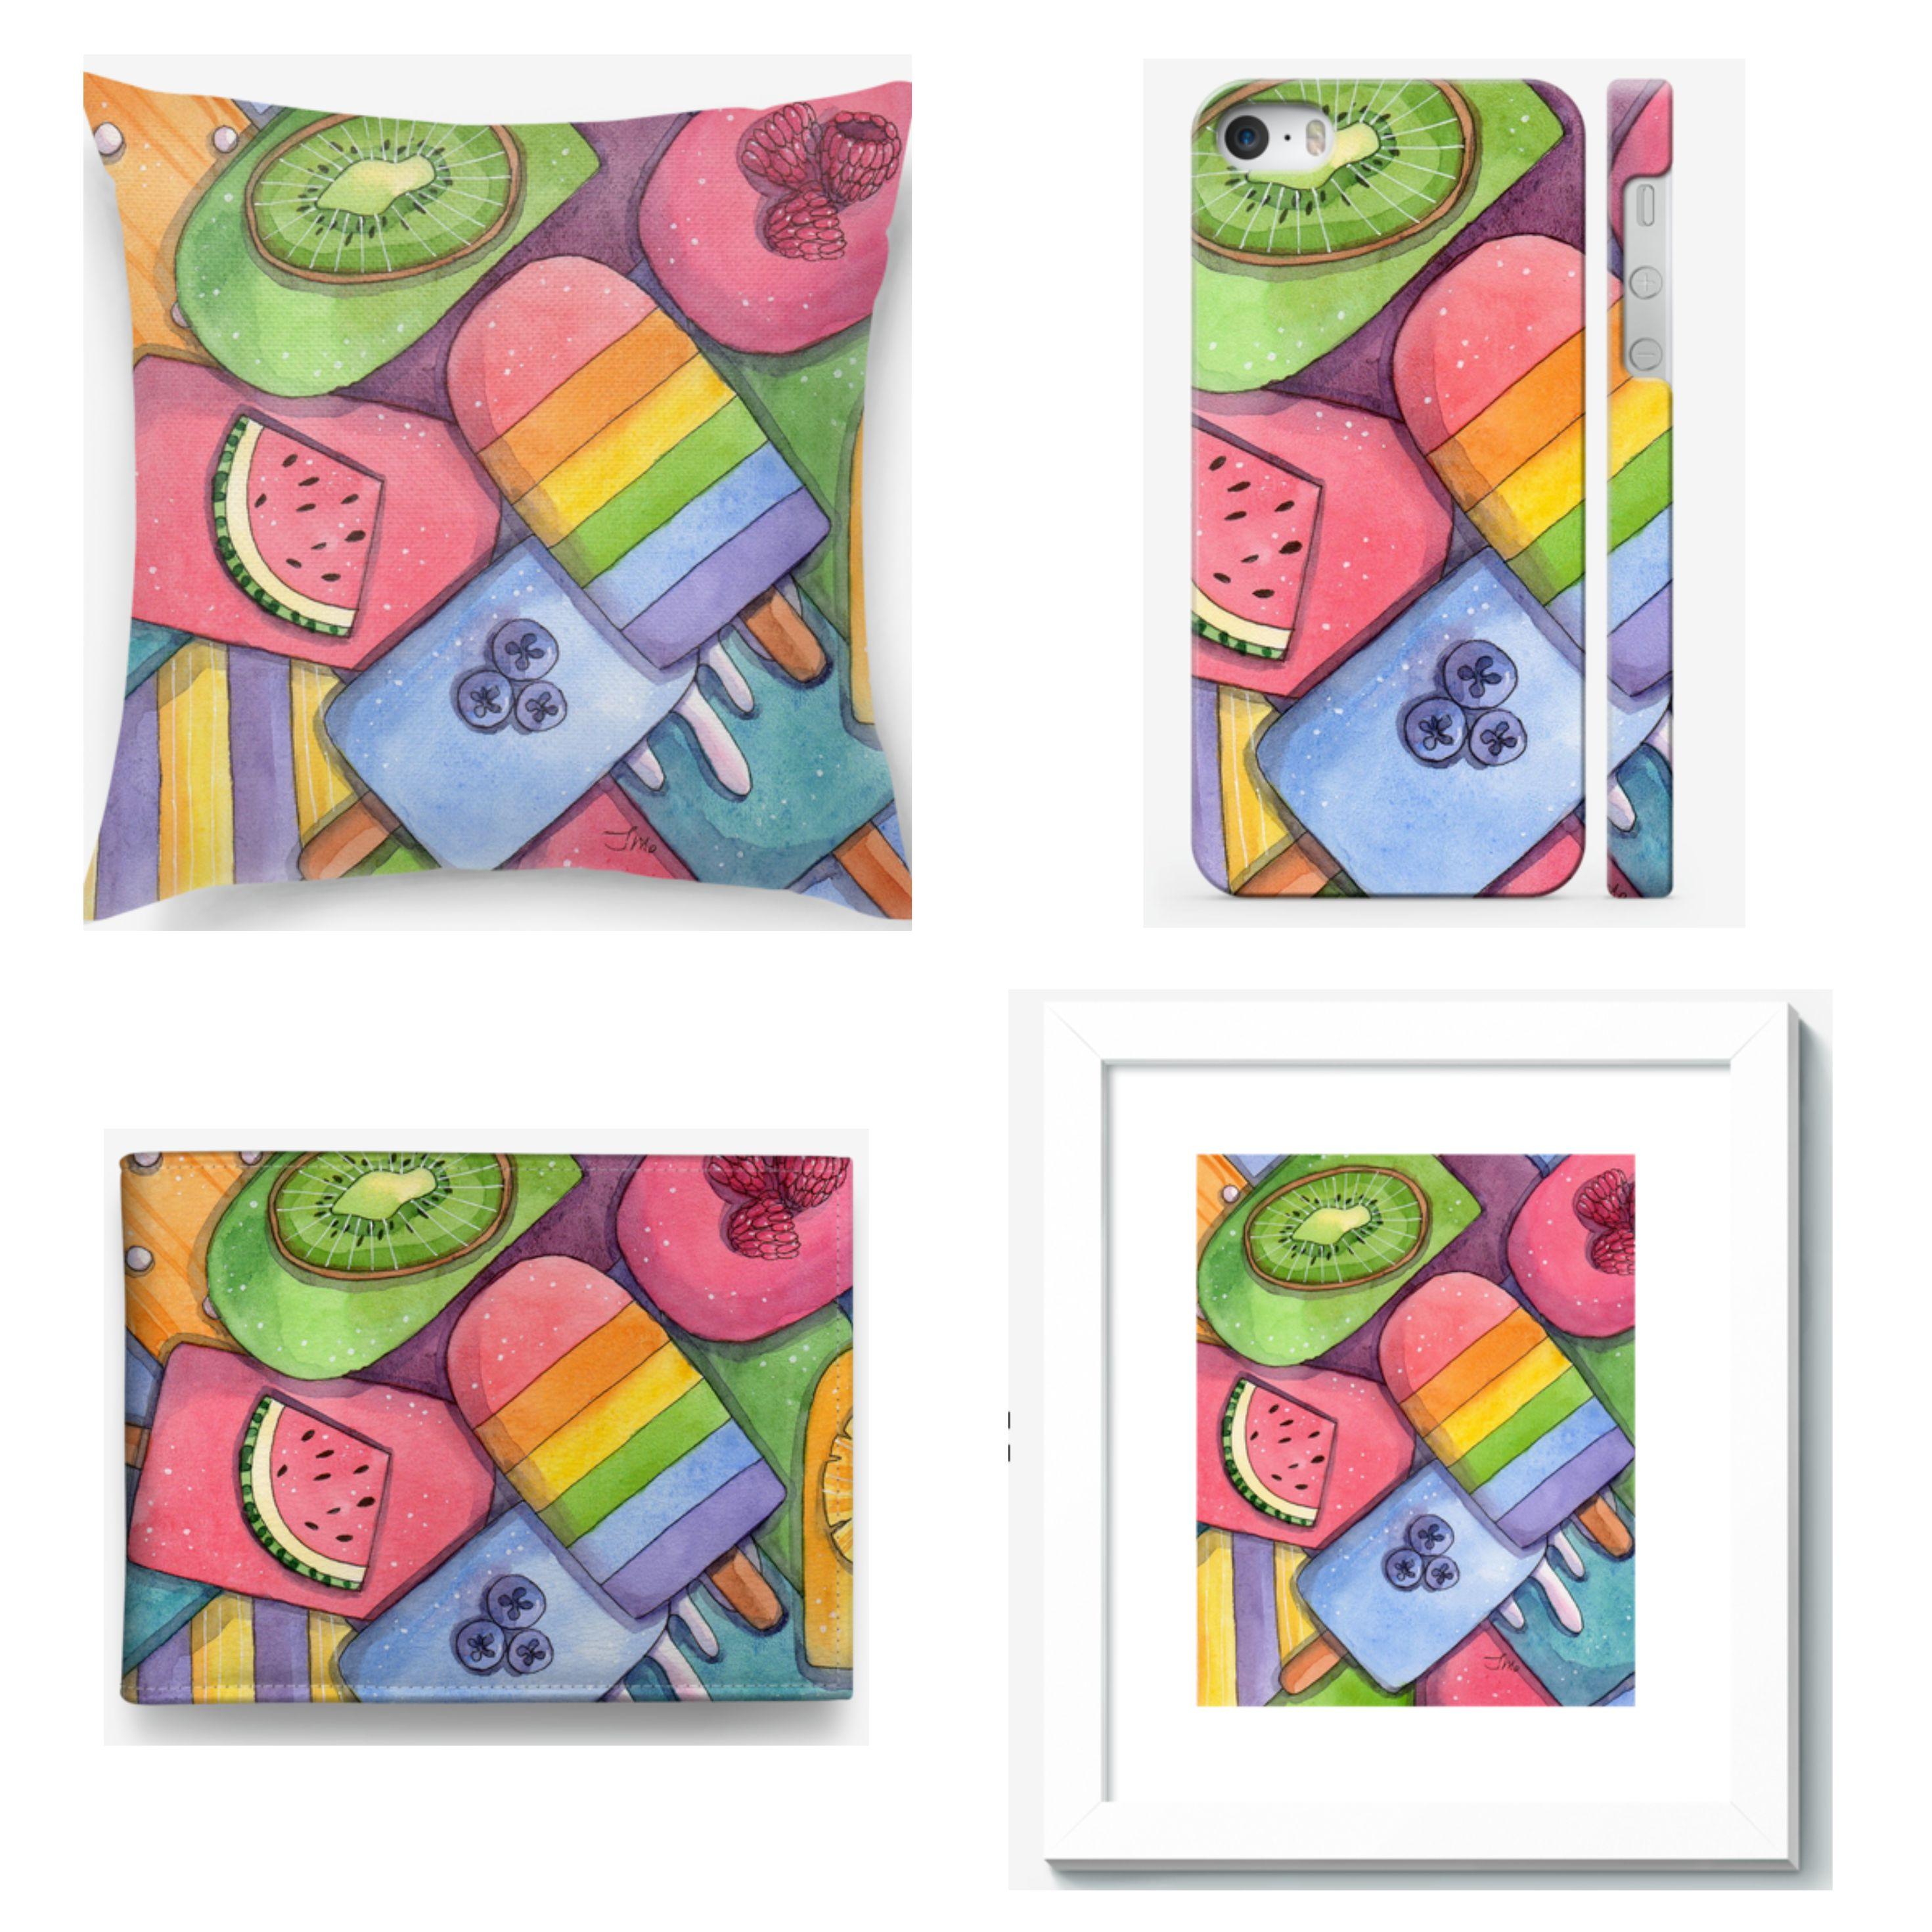 Чехлы, подушки, кошельки на Pinkbus